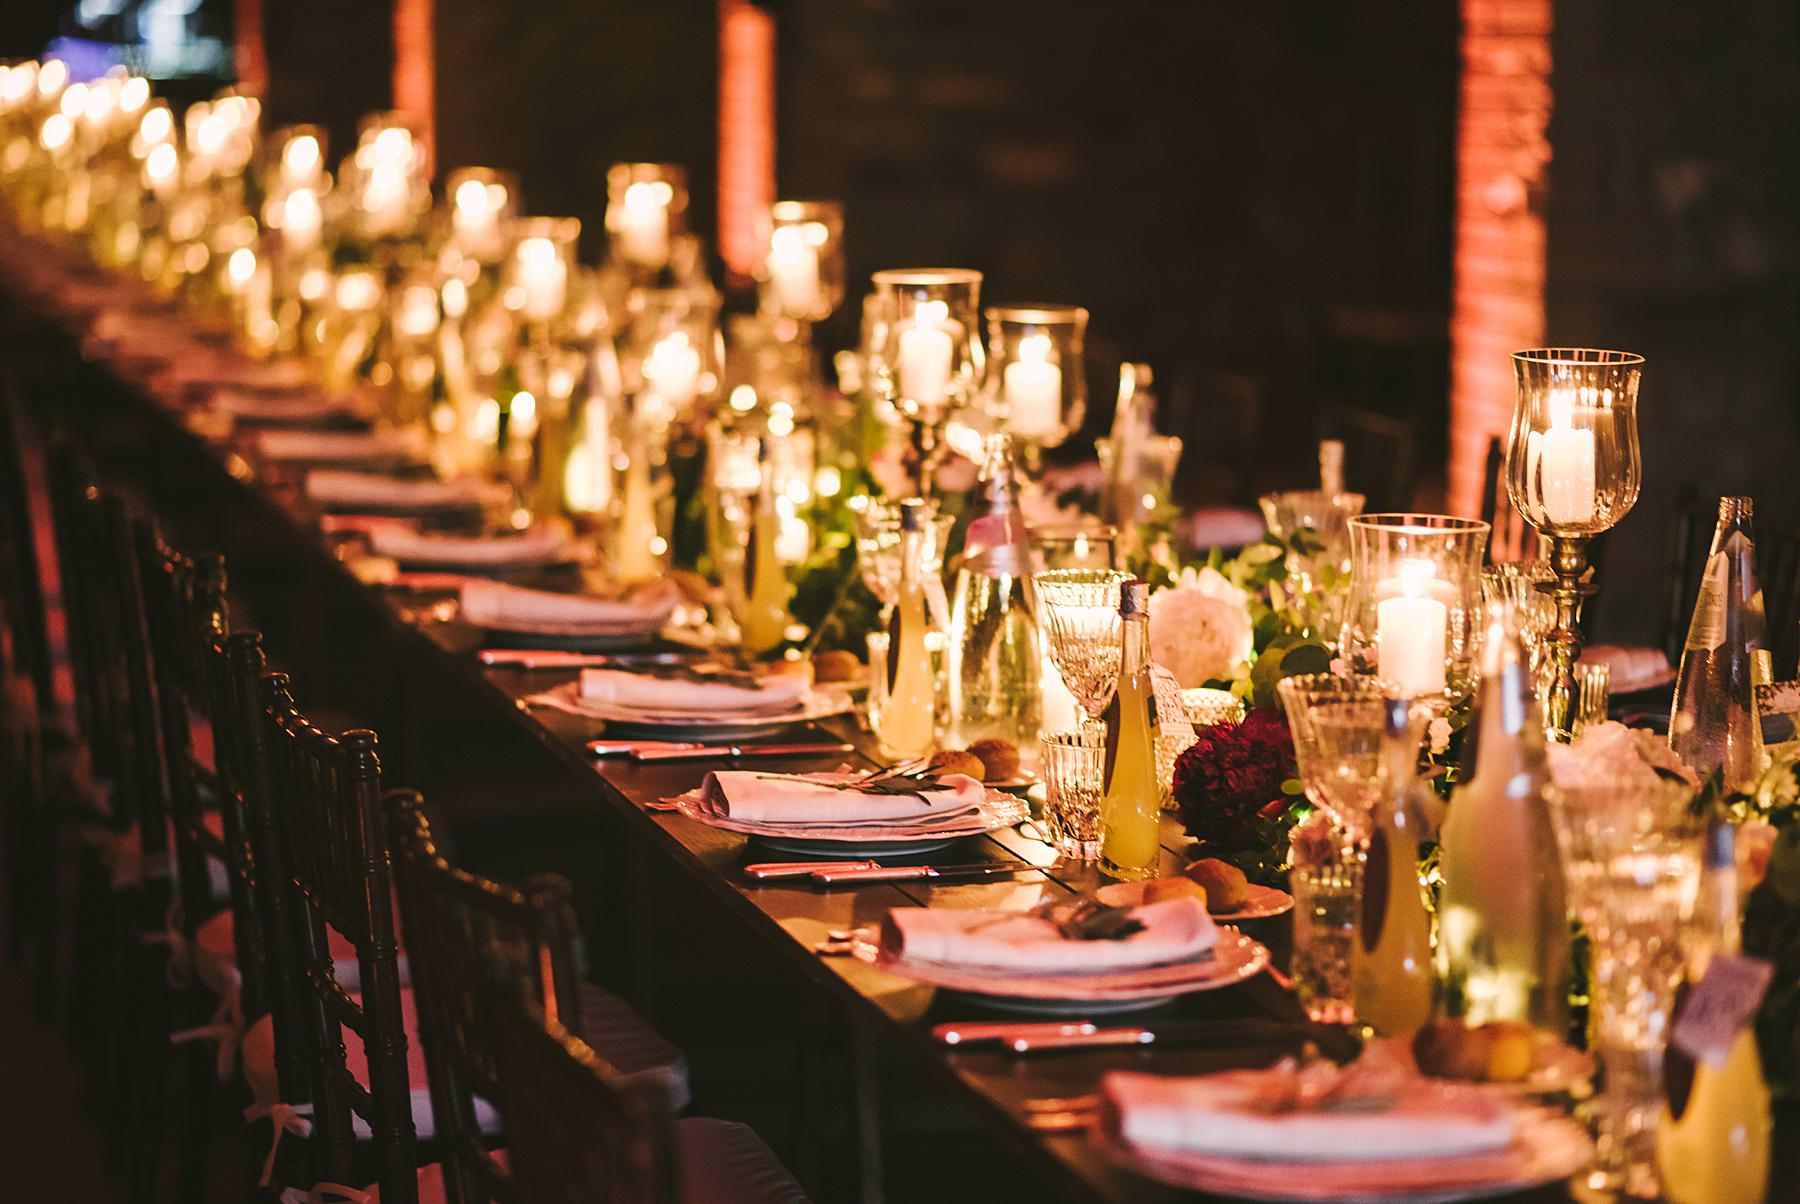 Lovely elegant indoor destination wedding dinner decor at historic estate of Villa La Selva Wine Resort in Tuscany countryside